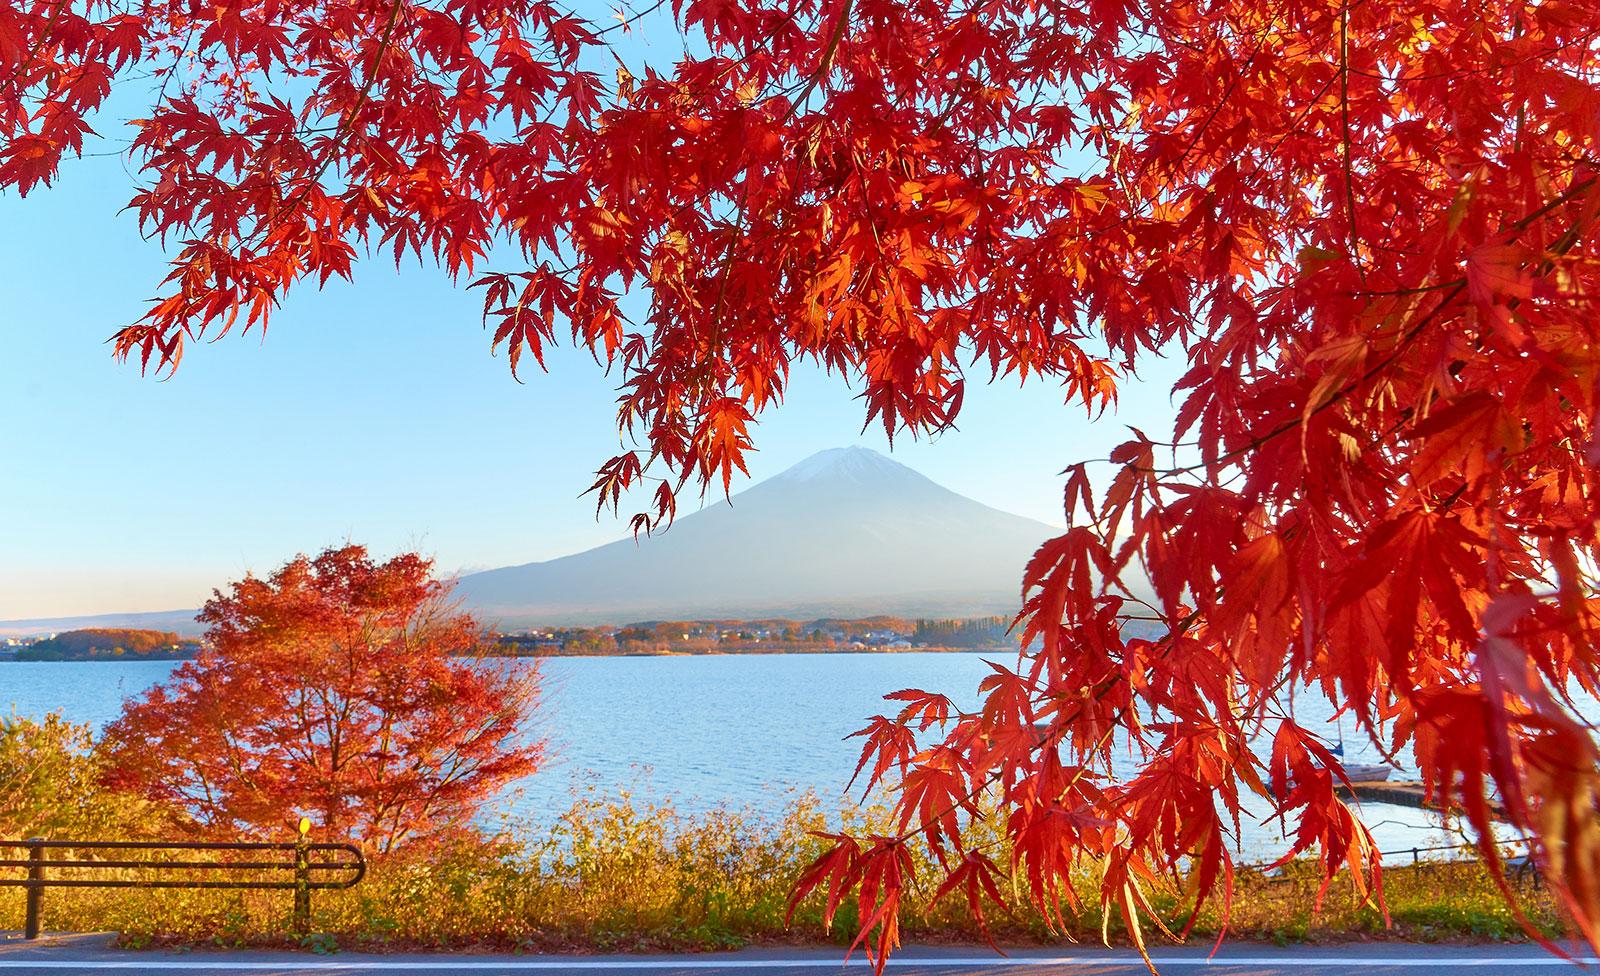 Falling Cherry Blossom Wallpaper Hd Japanese Autumn And Its Foodie Treats Gaijinpot